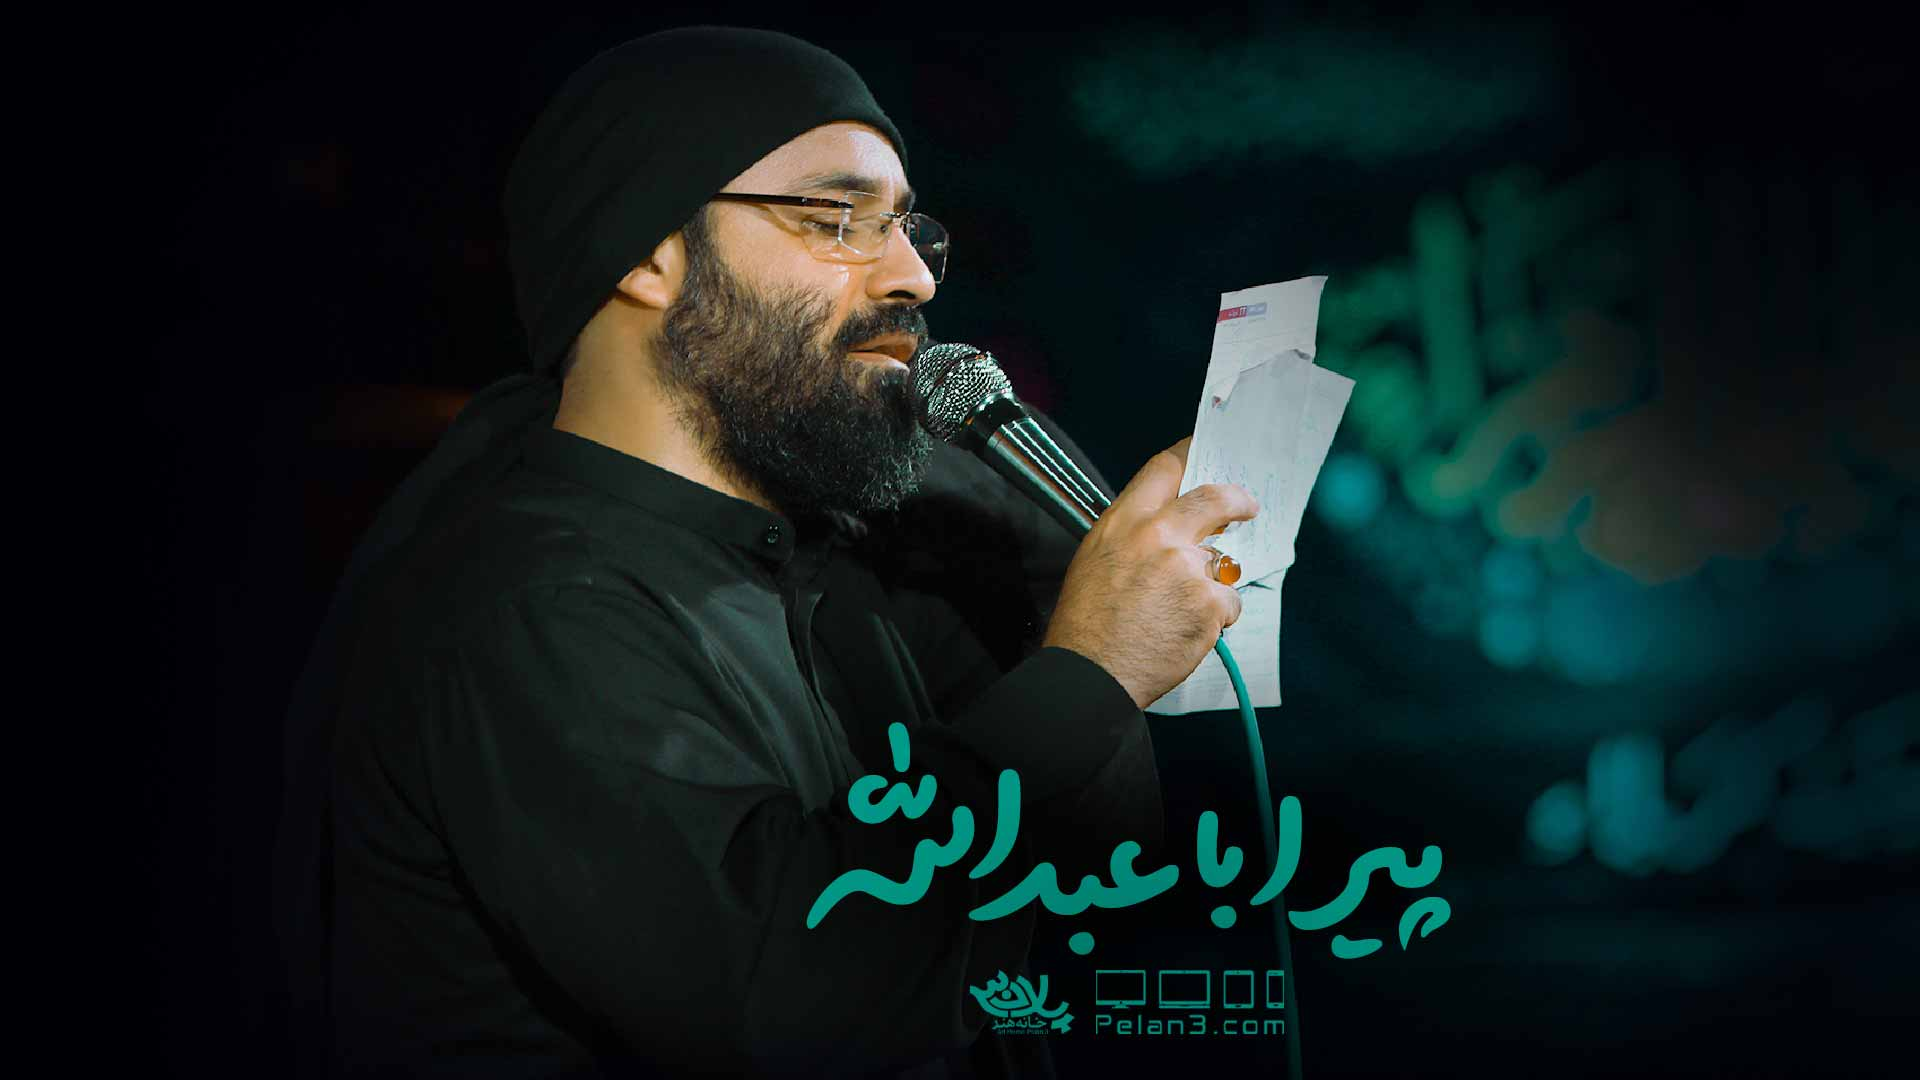 پیر اباعبدالله عبدالرضا هلالی